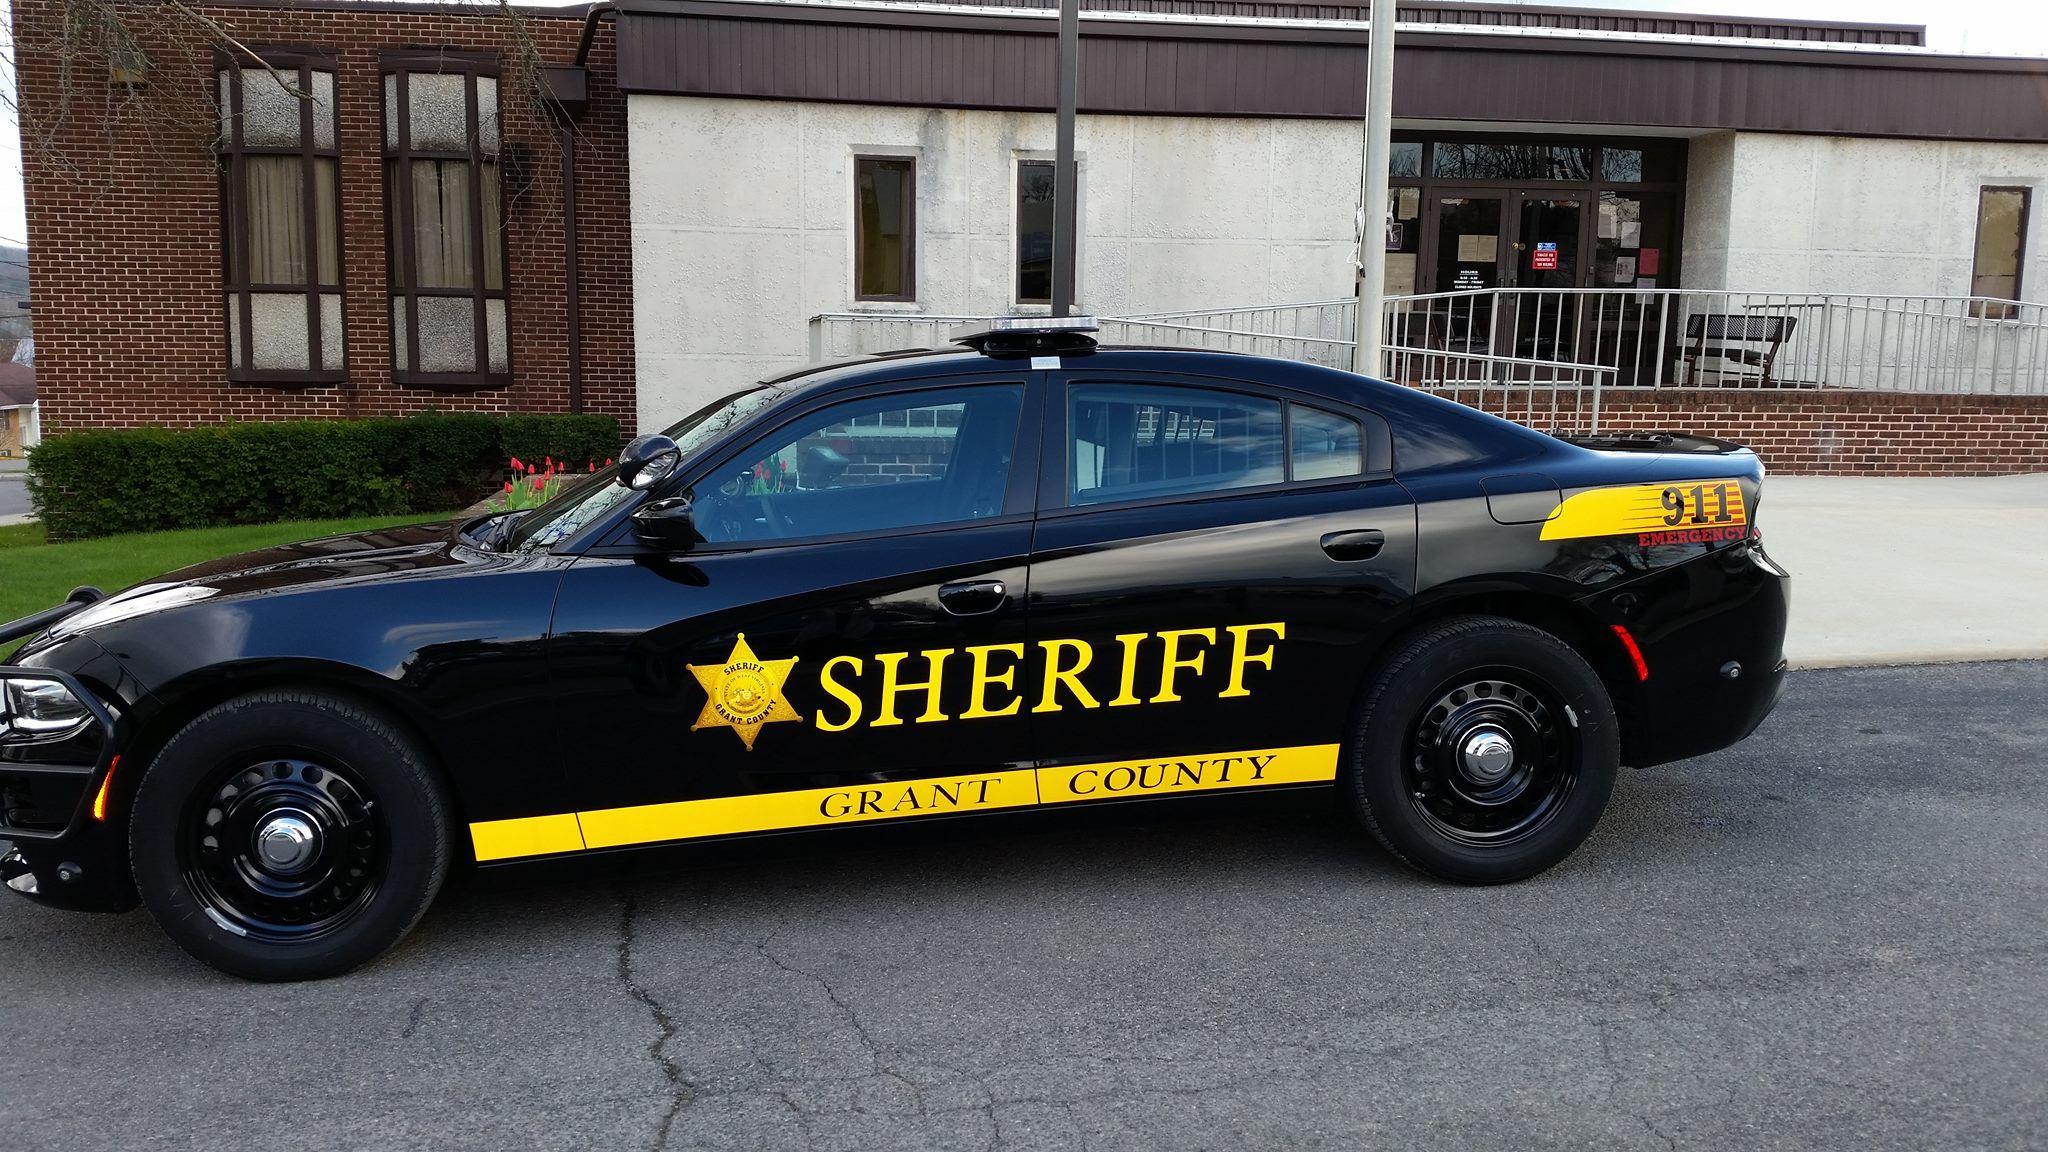 leon county sheriffs department - HD2048×1152